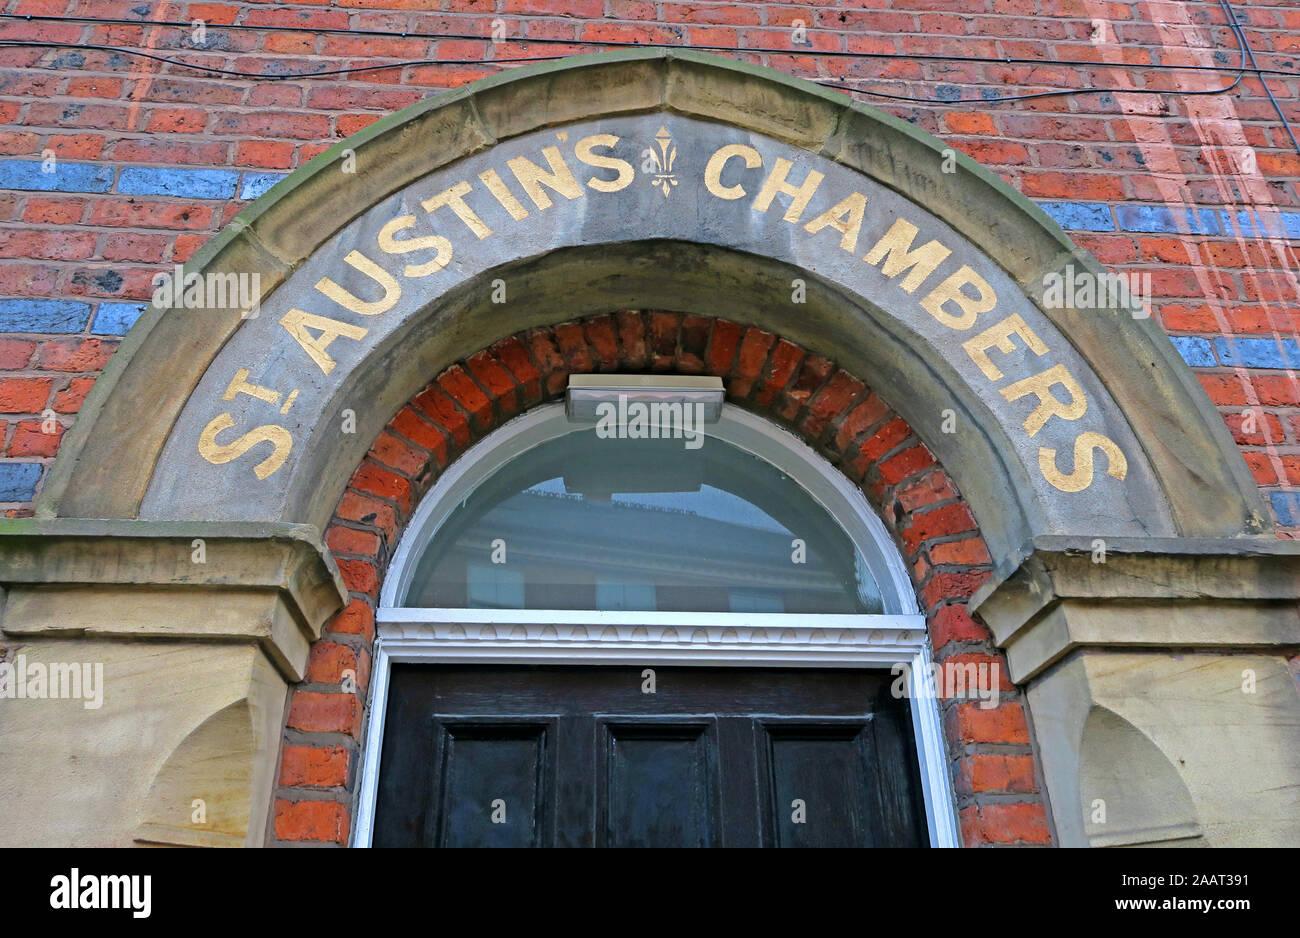 St Austins Chambers building, St Austins Lane, Warrington, Cheshire, England, WA1 1HG Stock Photo